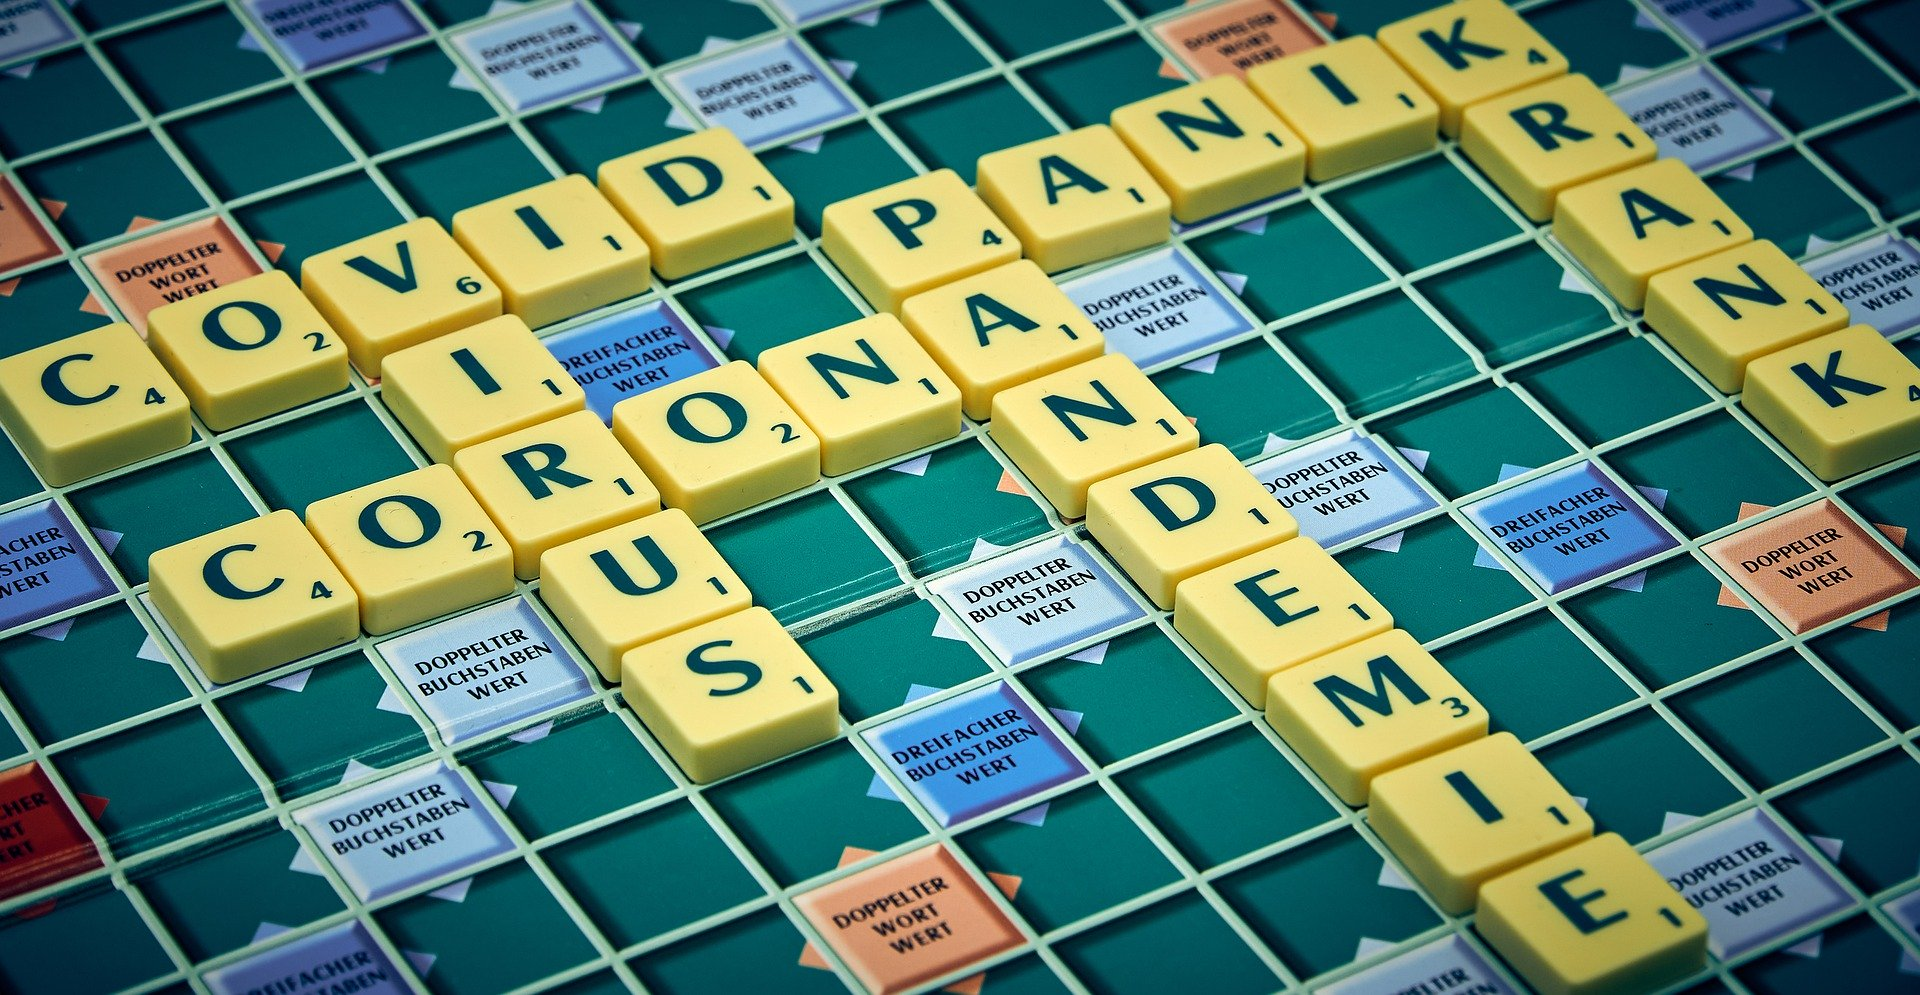 Corona puzzle